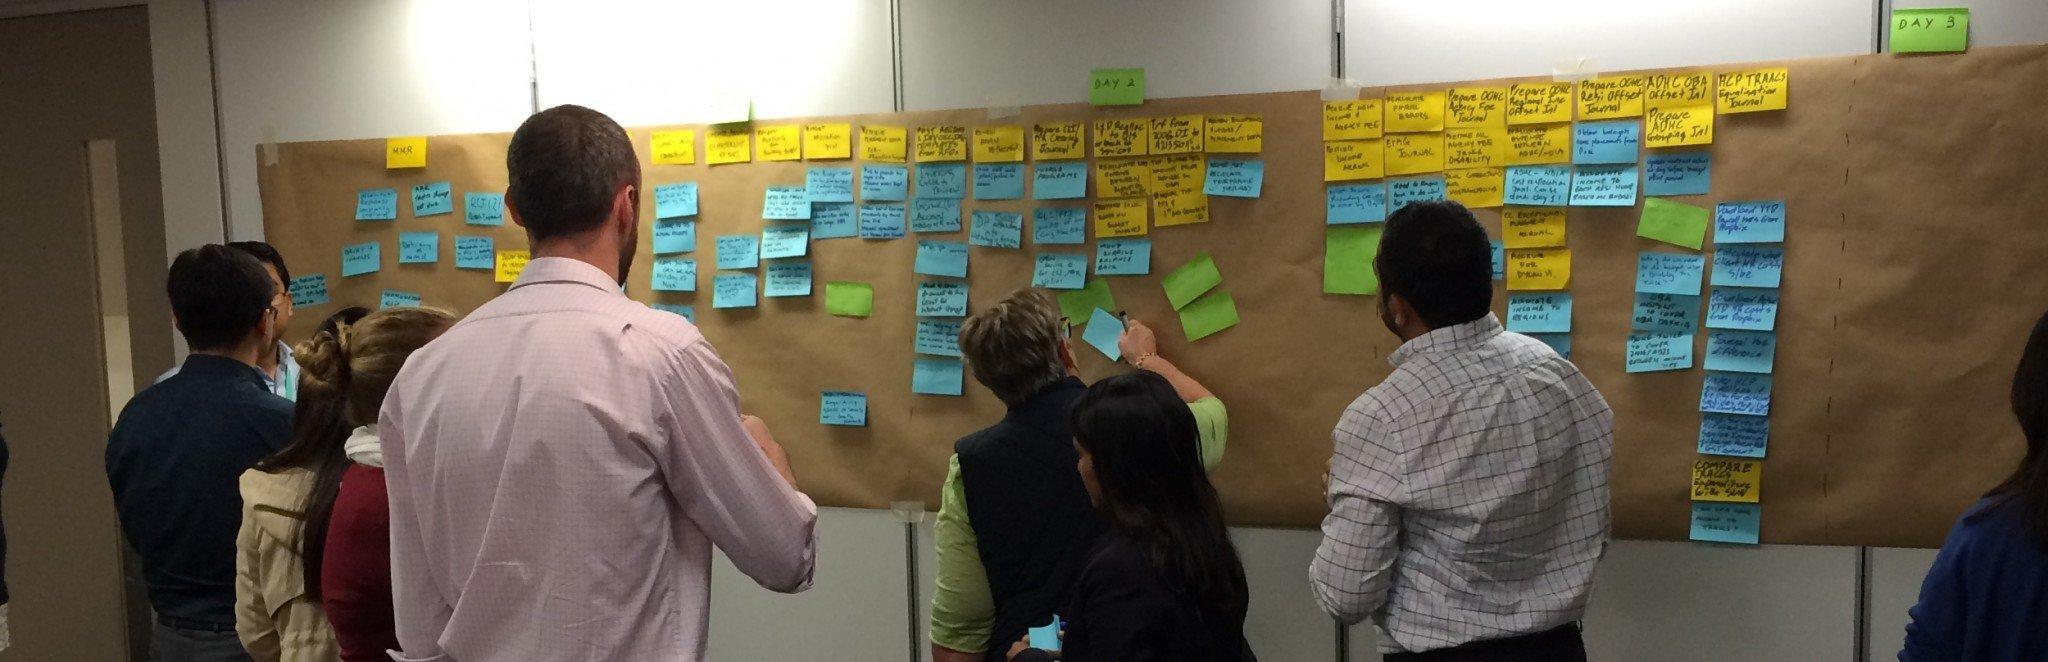 Gestaltix Team Workshop activity